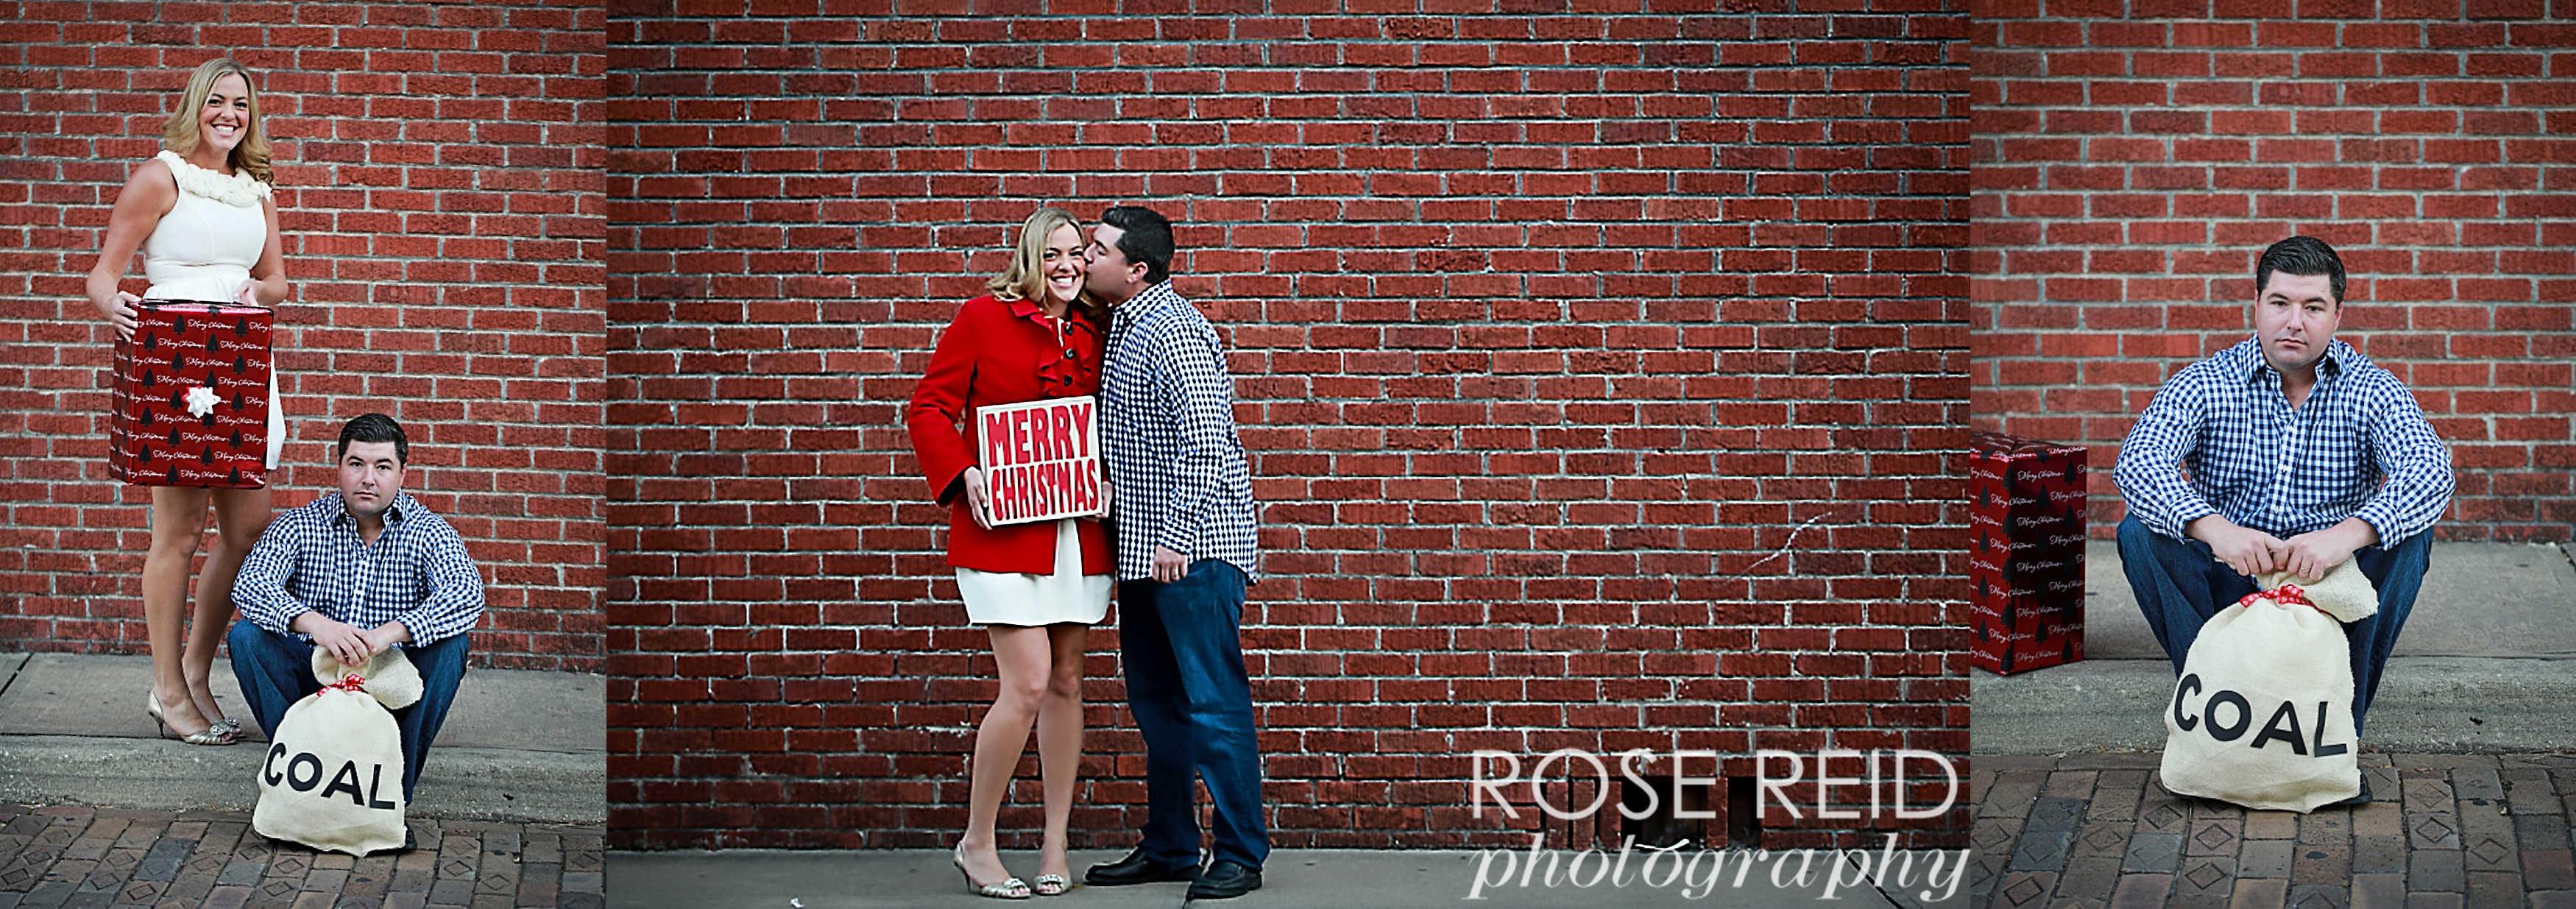 couples christmas and holiday photo orlando and winter garden